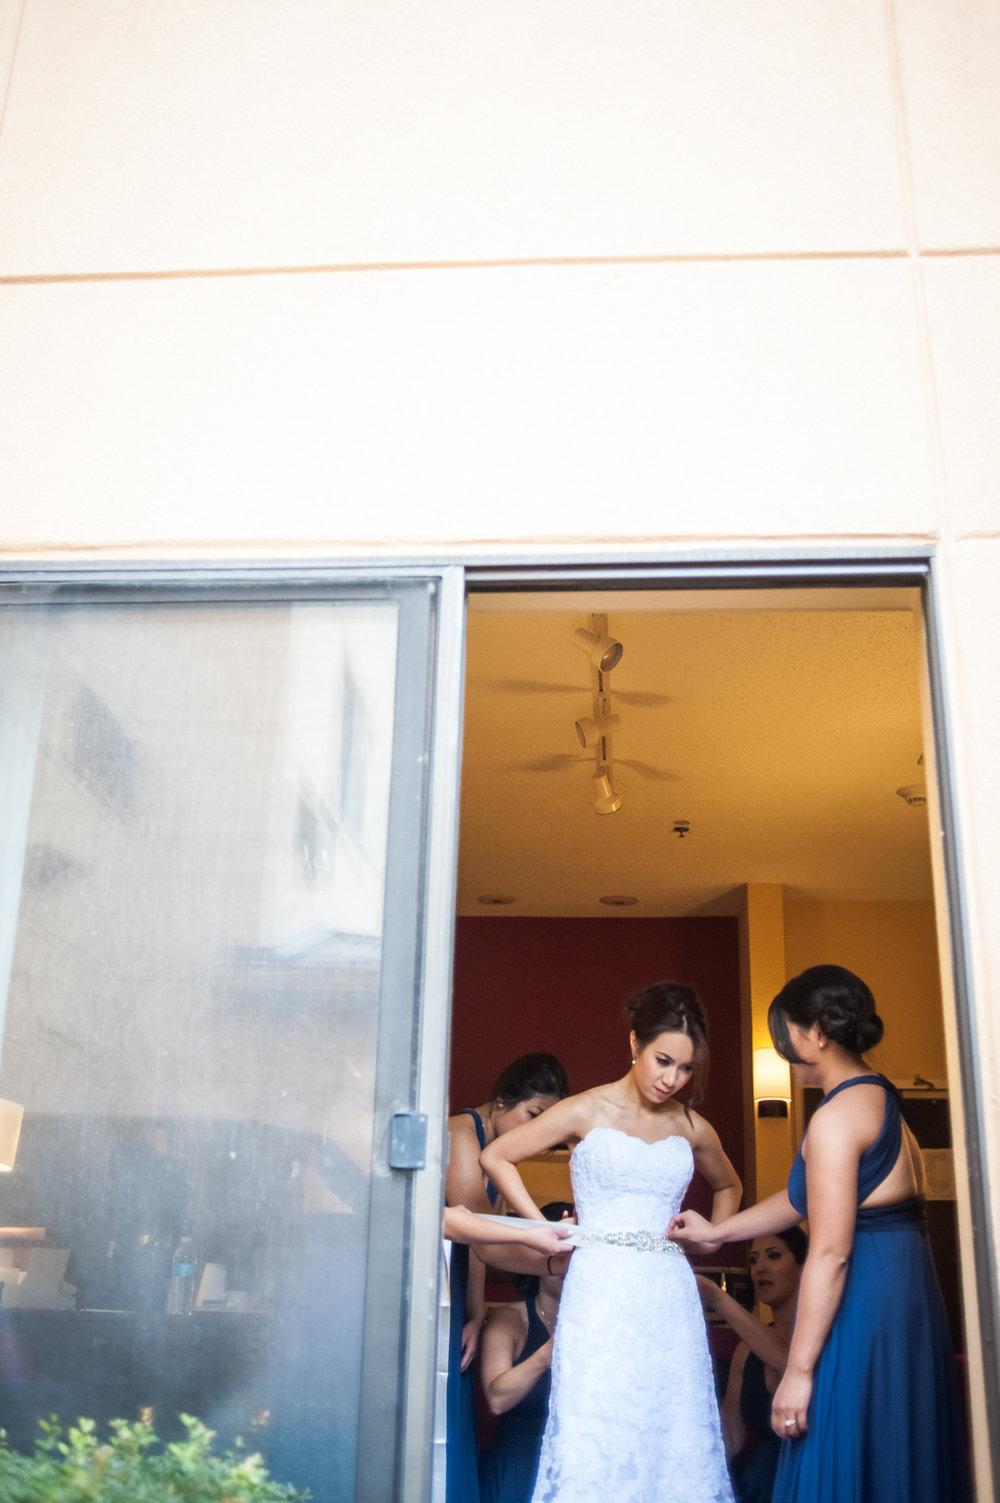 20-David Loi Studios - Venetian Terrace - Las Colinas - DFW- Texas-7.jpg